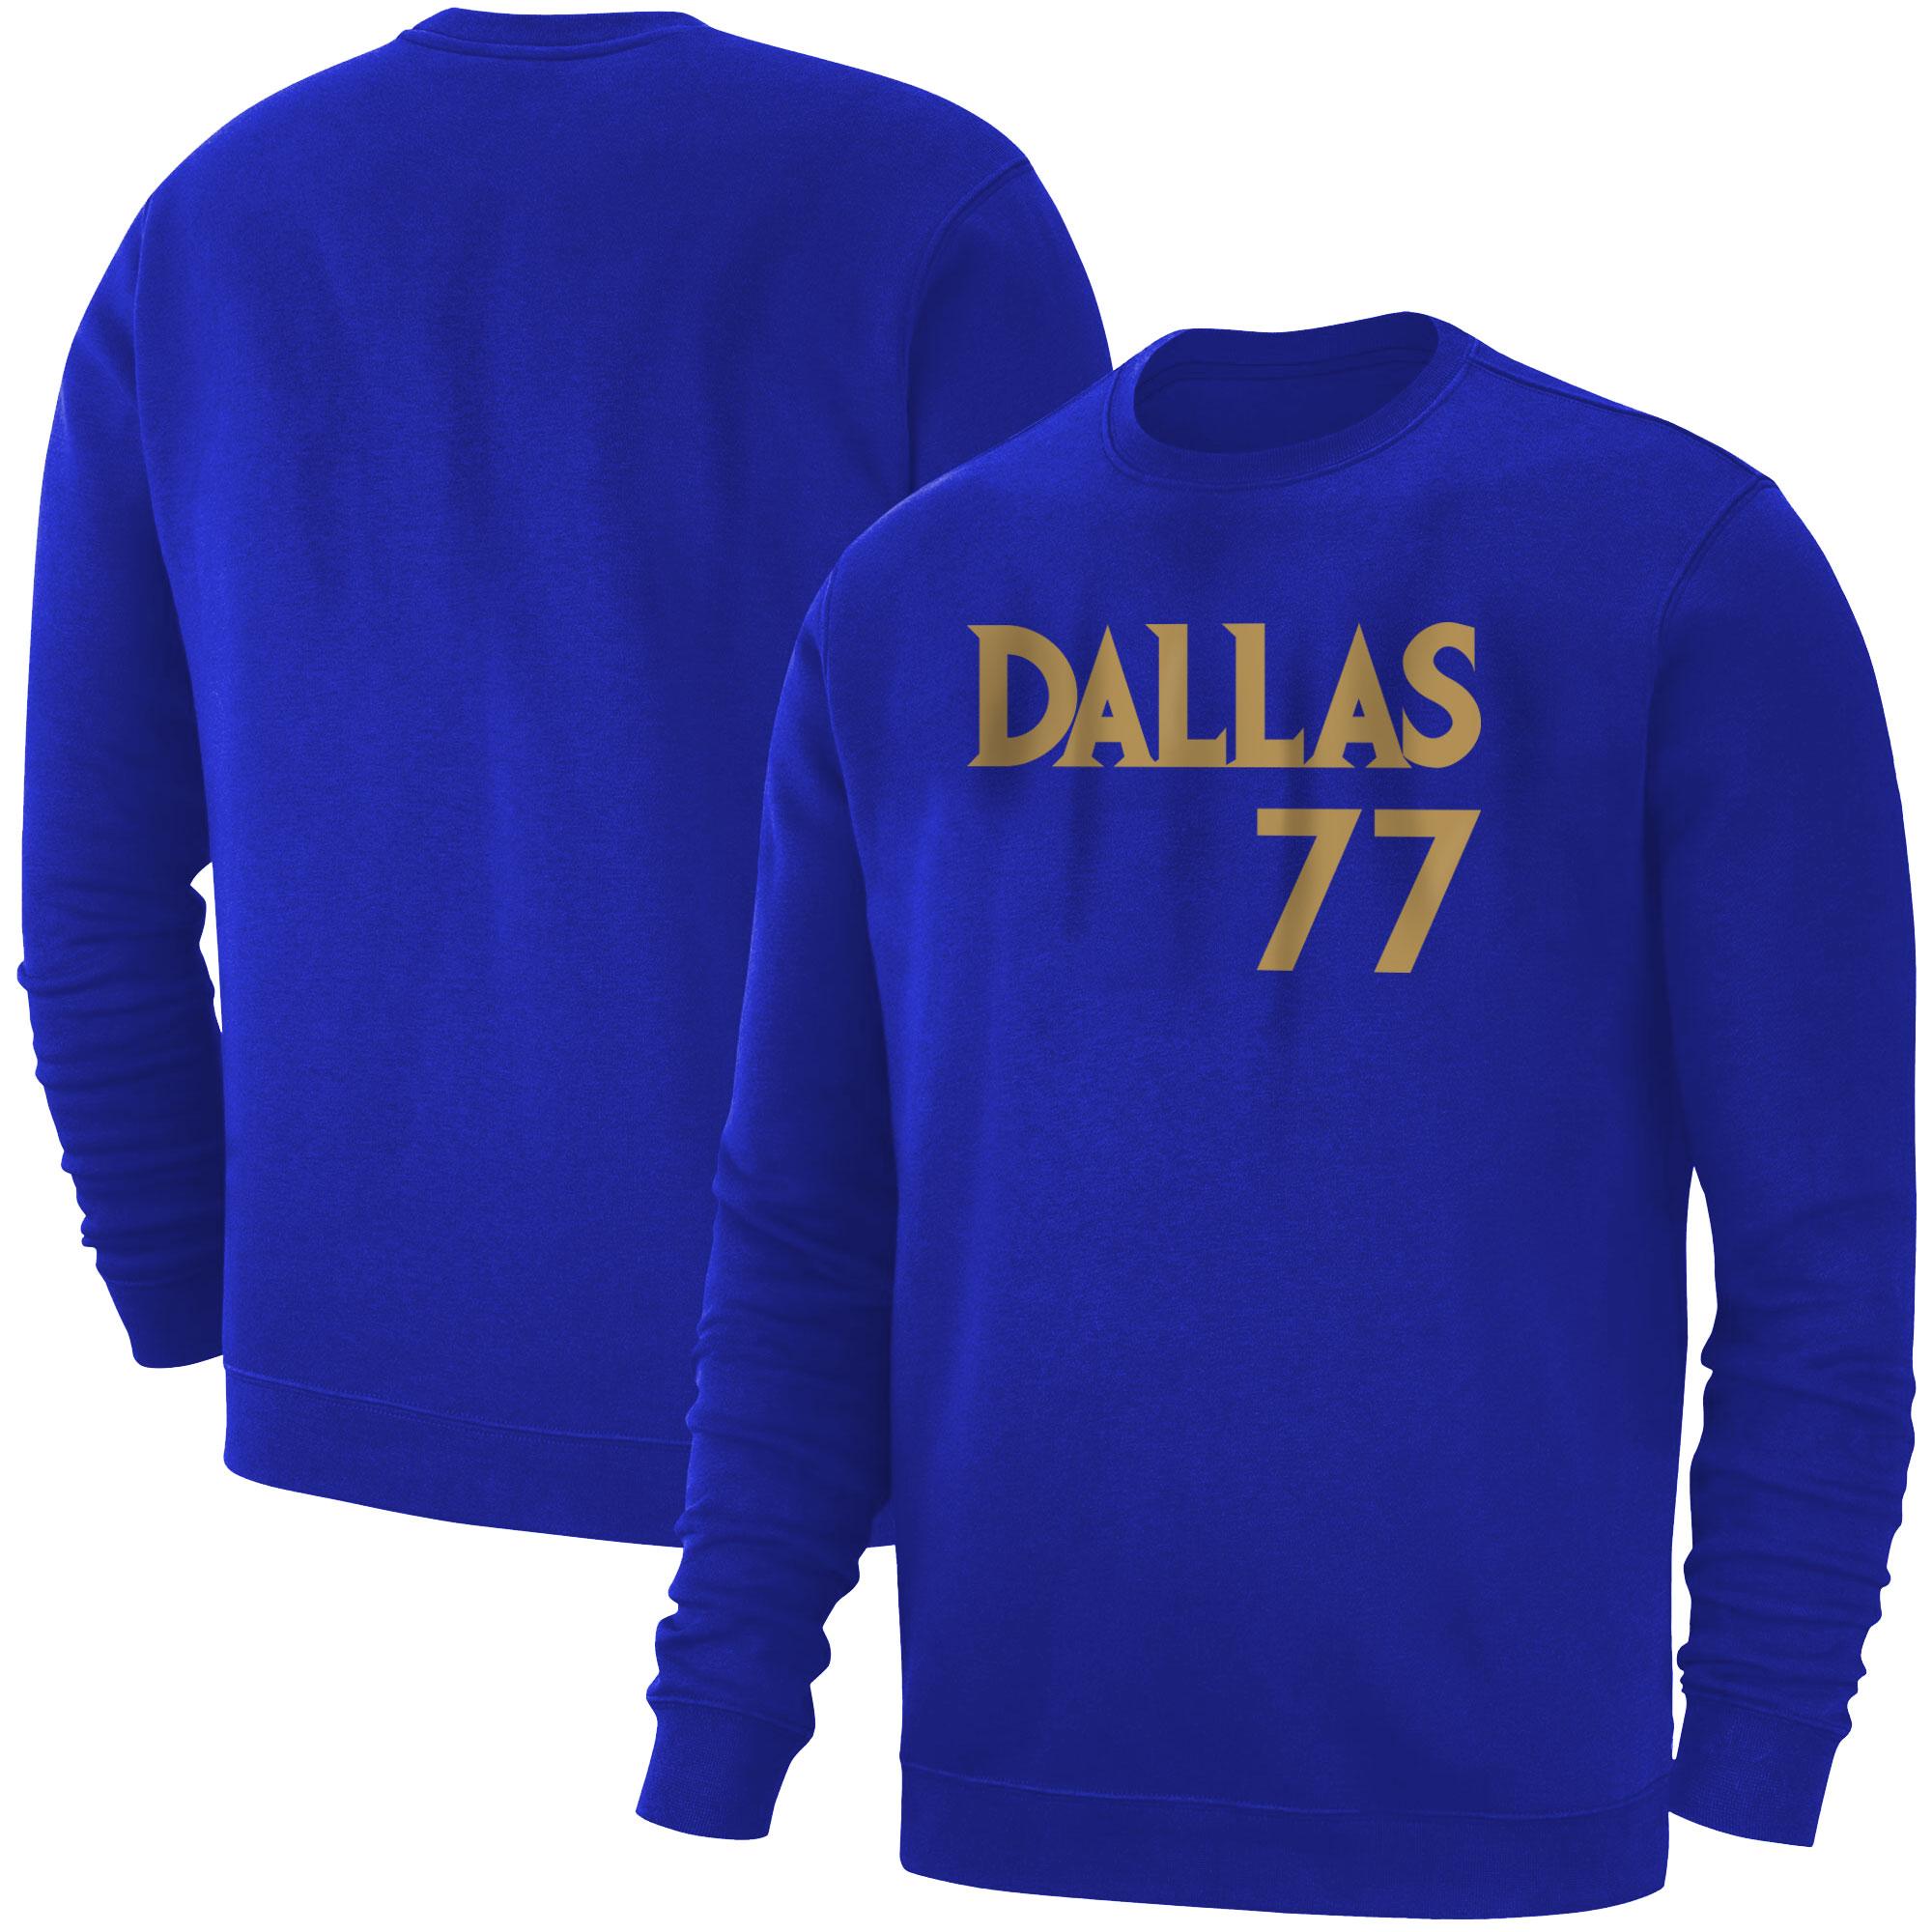 Dallas Dončić Basic (BSC-BLU-489-NBA-DALLAS-DONCIC)